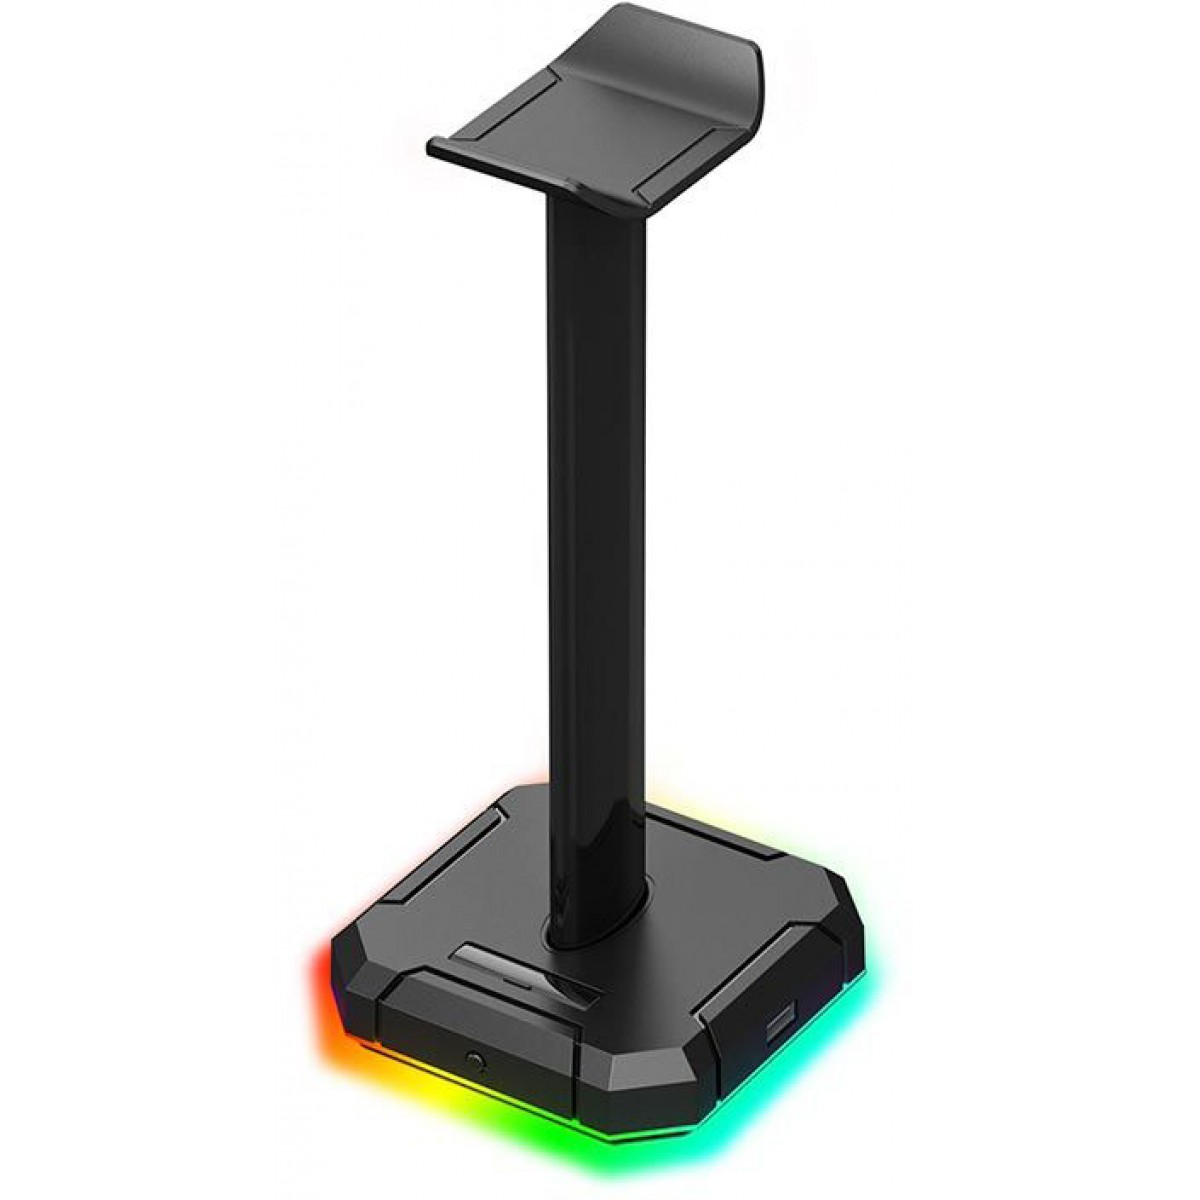 Suporte para Headset Redragon Scepter Pro RGB, Black, HA300